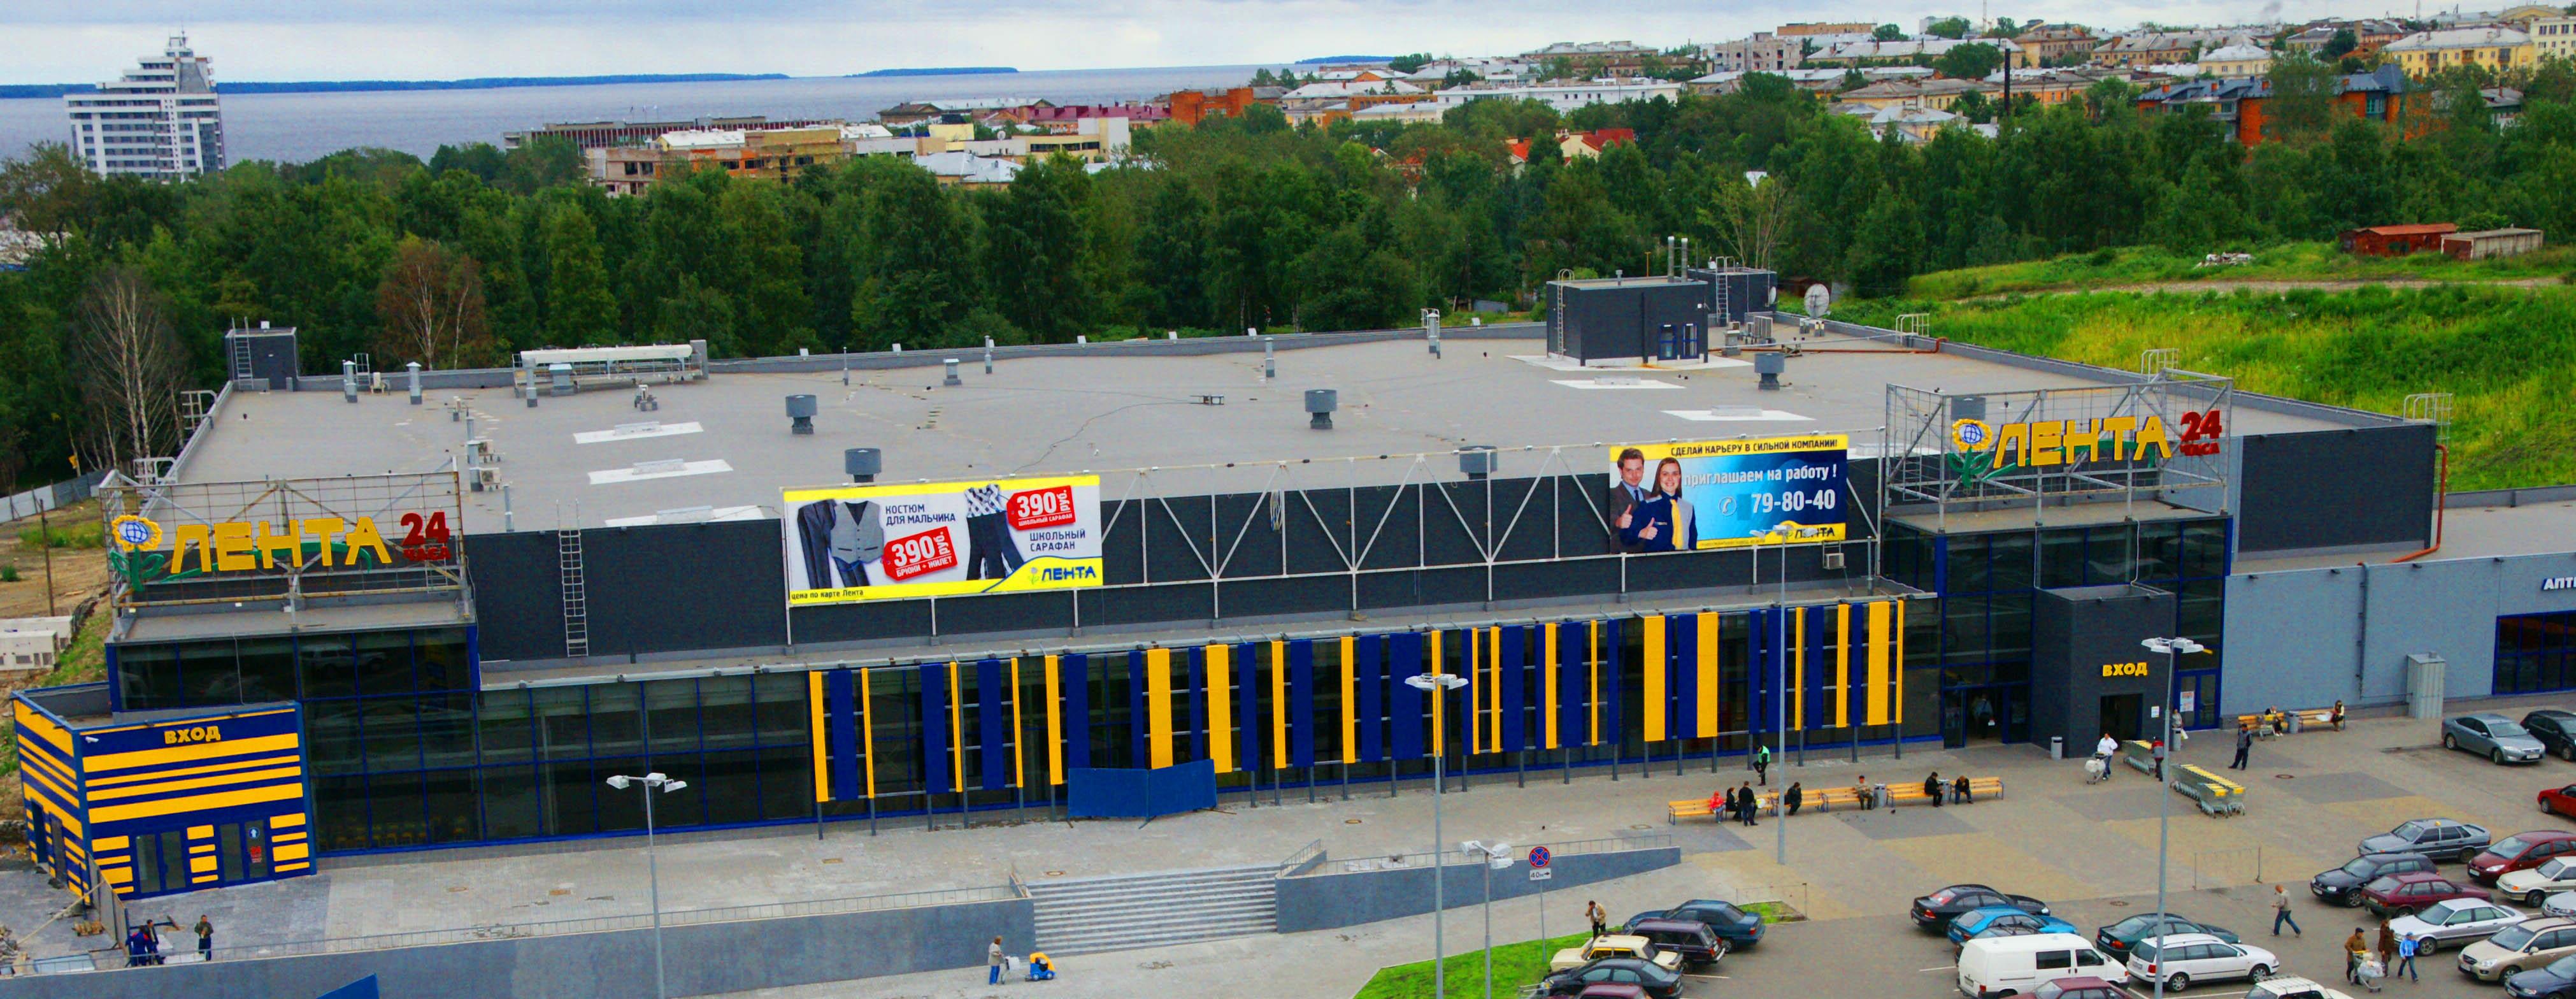 """Лента"" пришла в Петрозаводск при бывшем мэре Викторе Маслякове. Фото: Губернiя Daily"